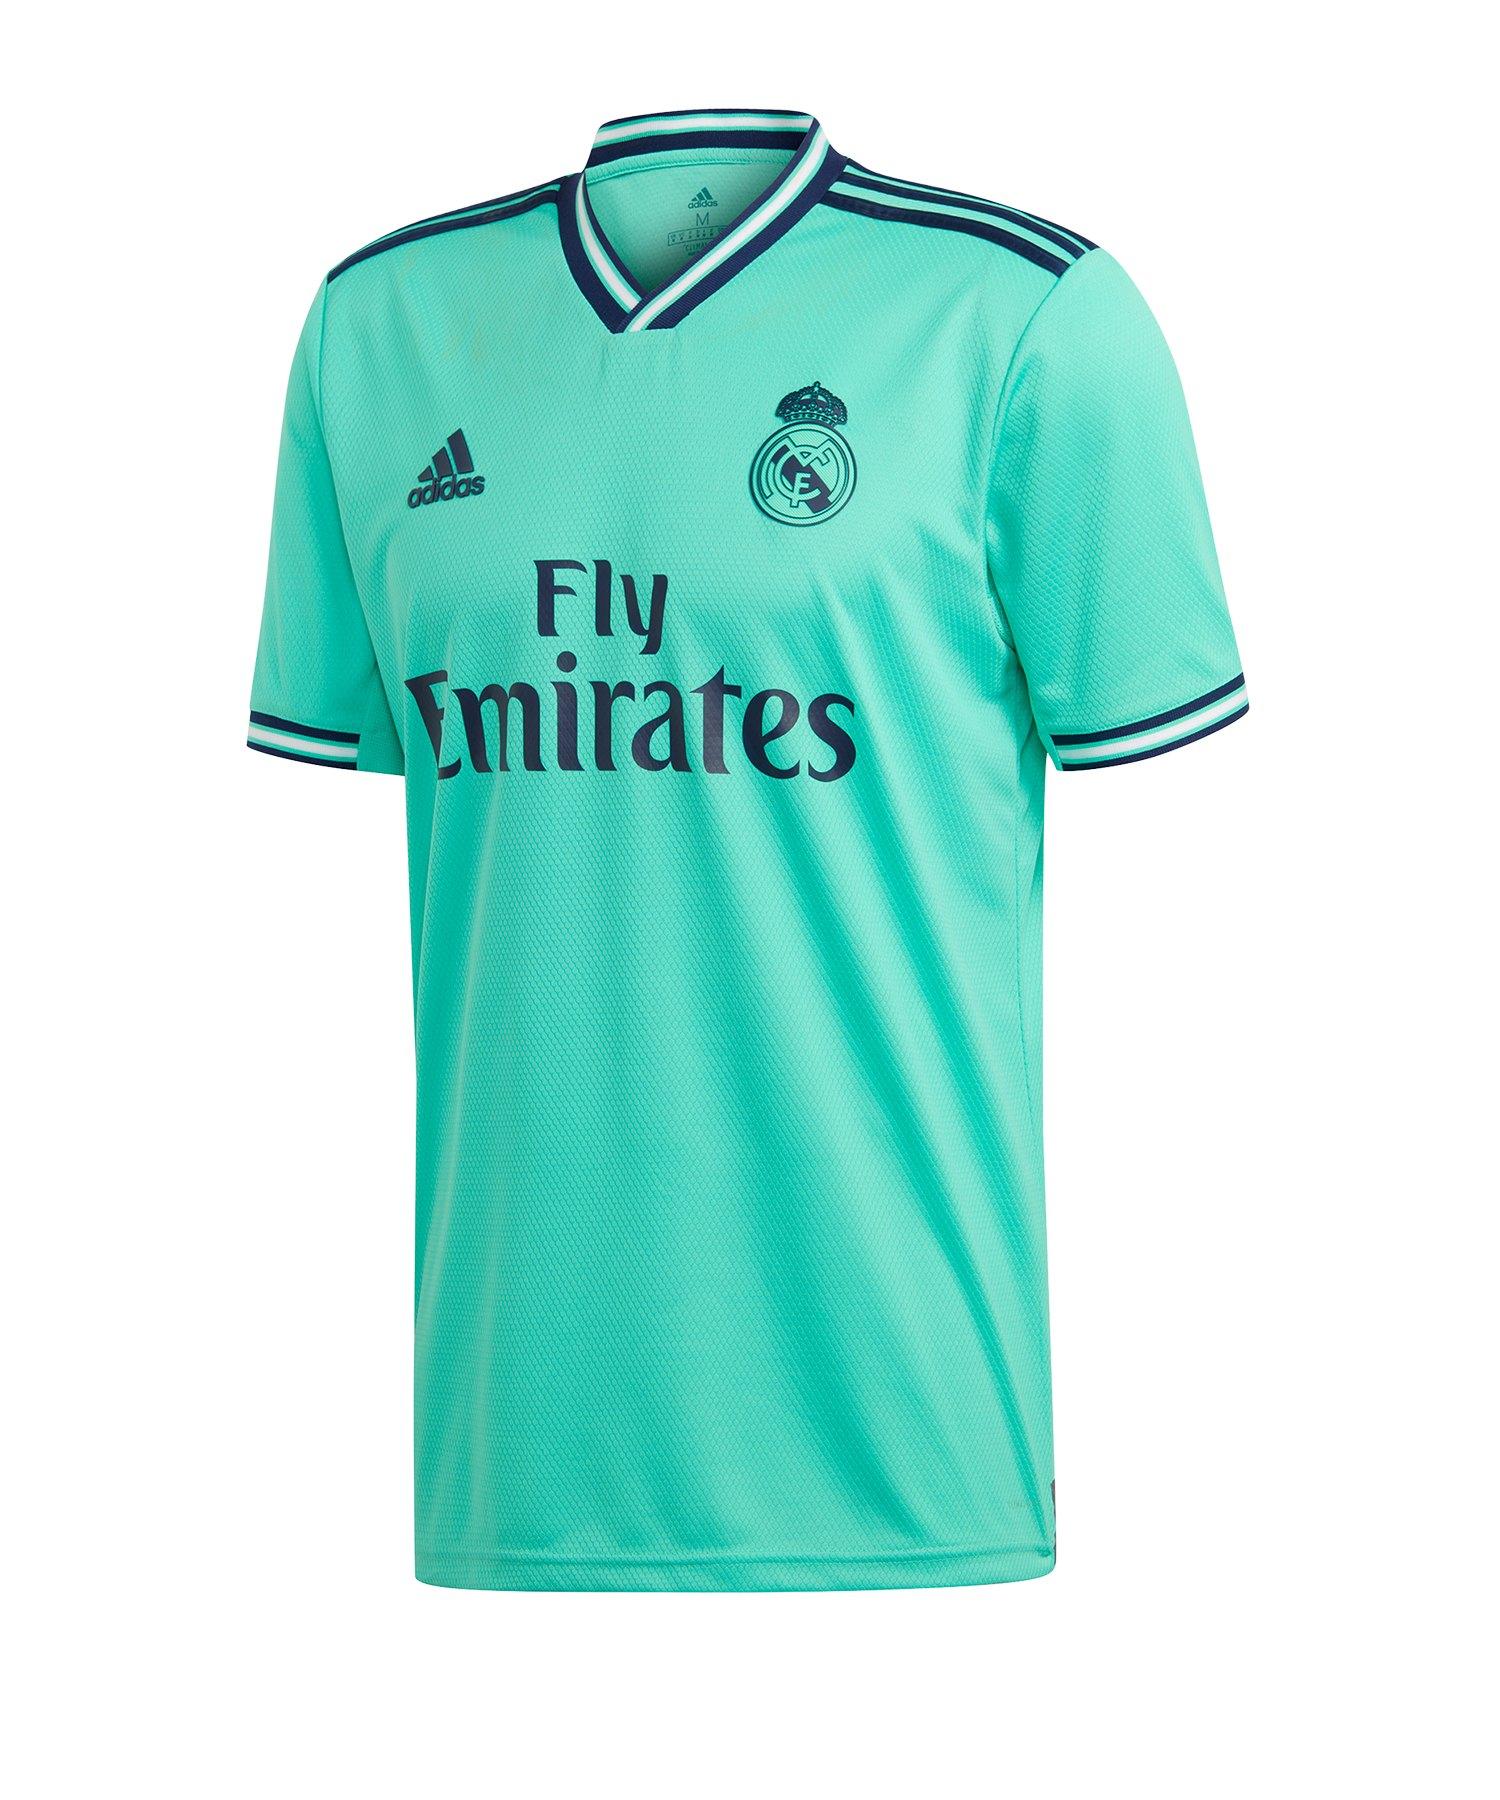 adidas Real Madrid Trikot UCL 2019/2020 Grün - gruen